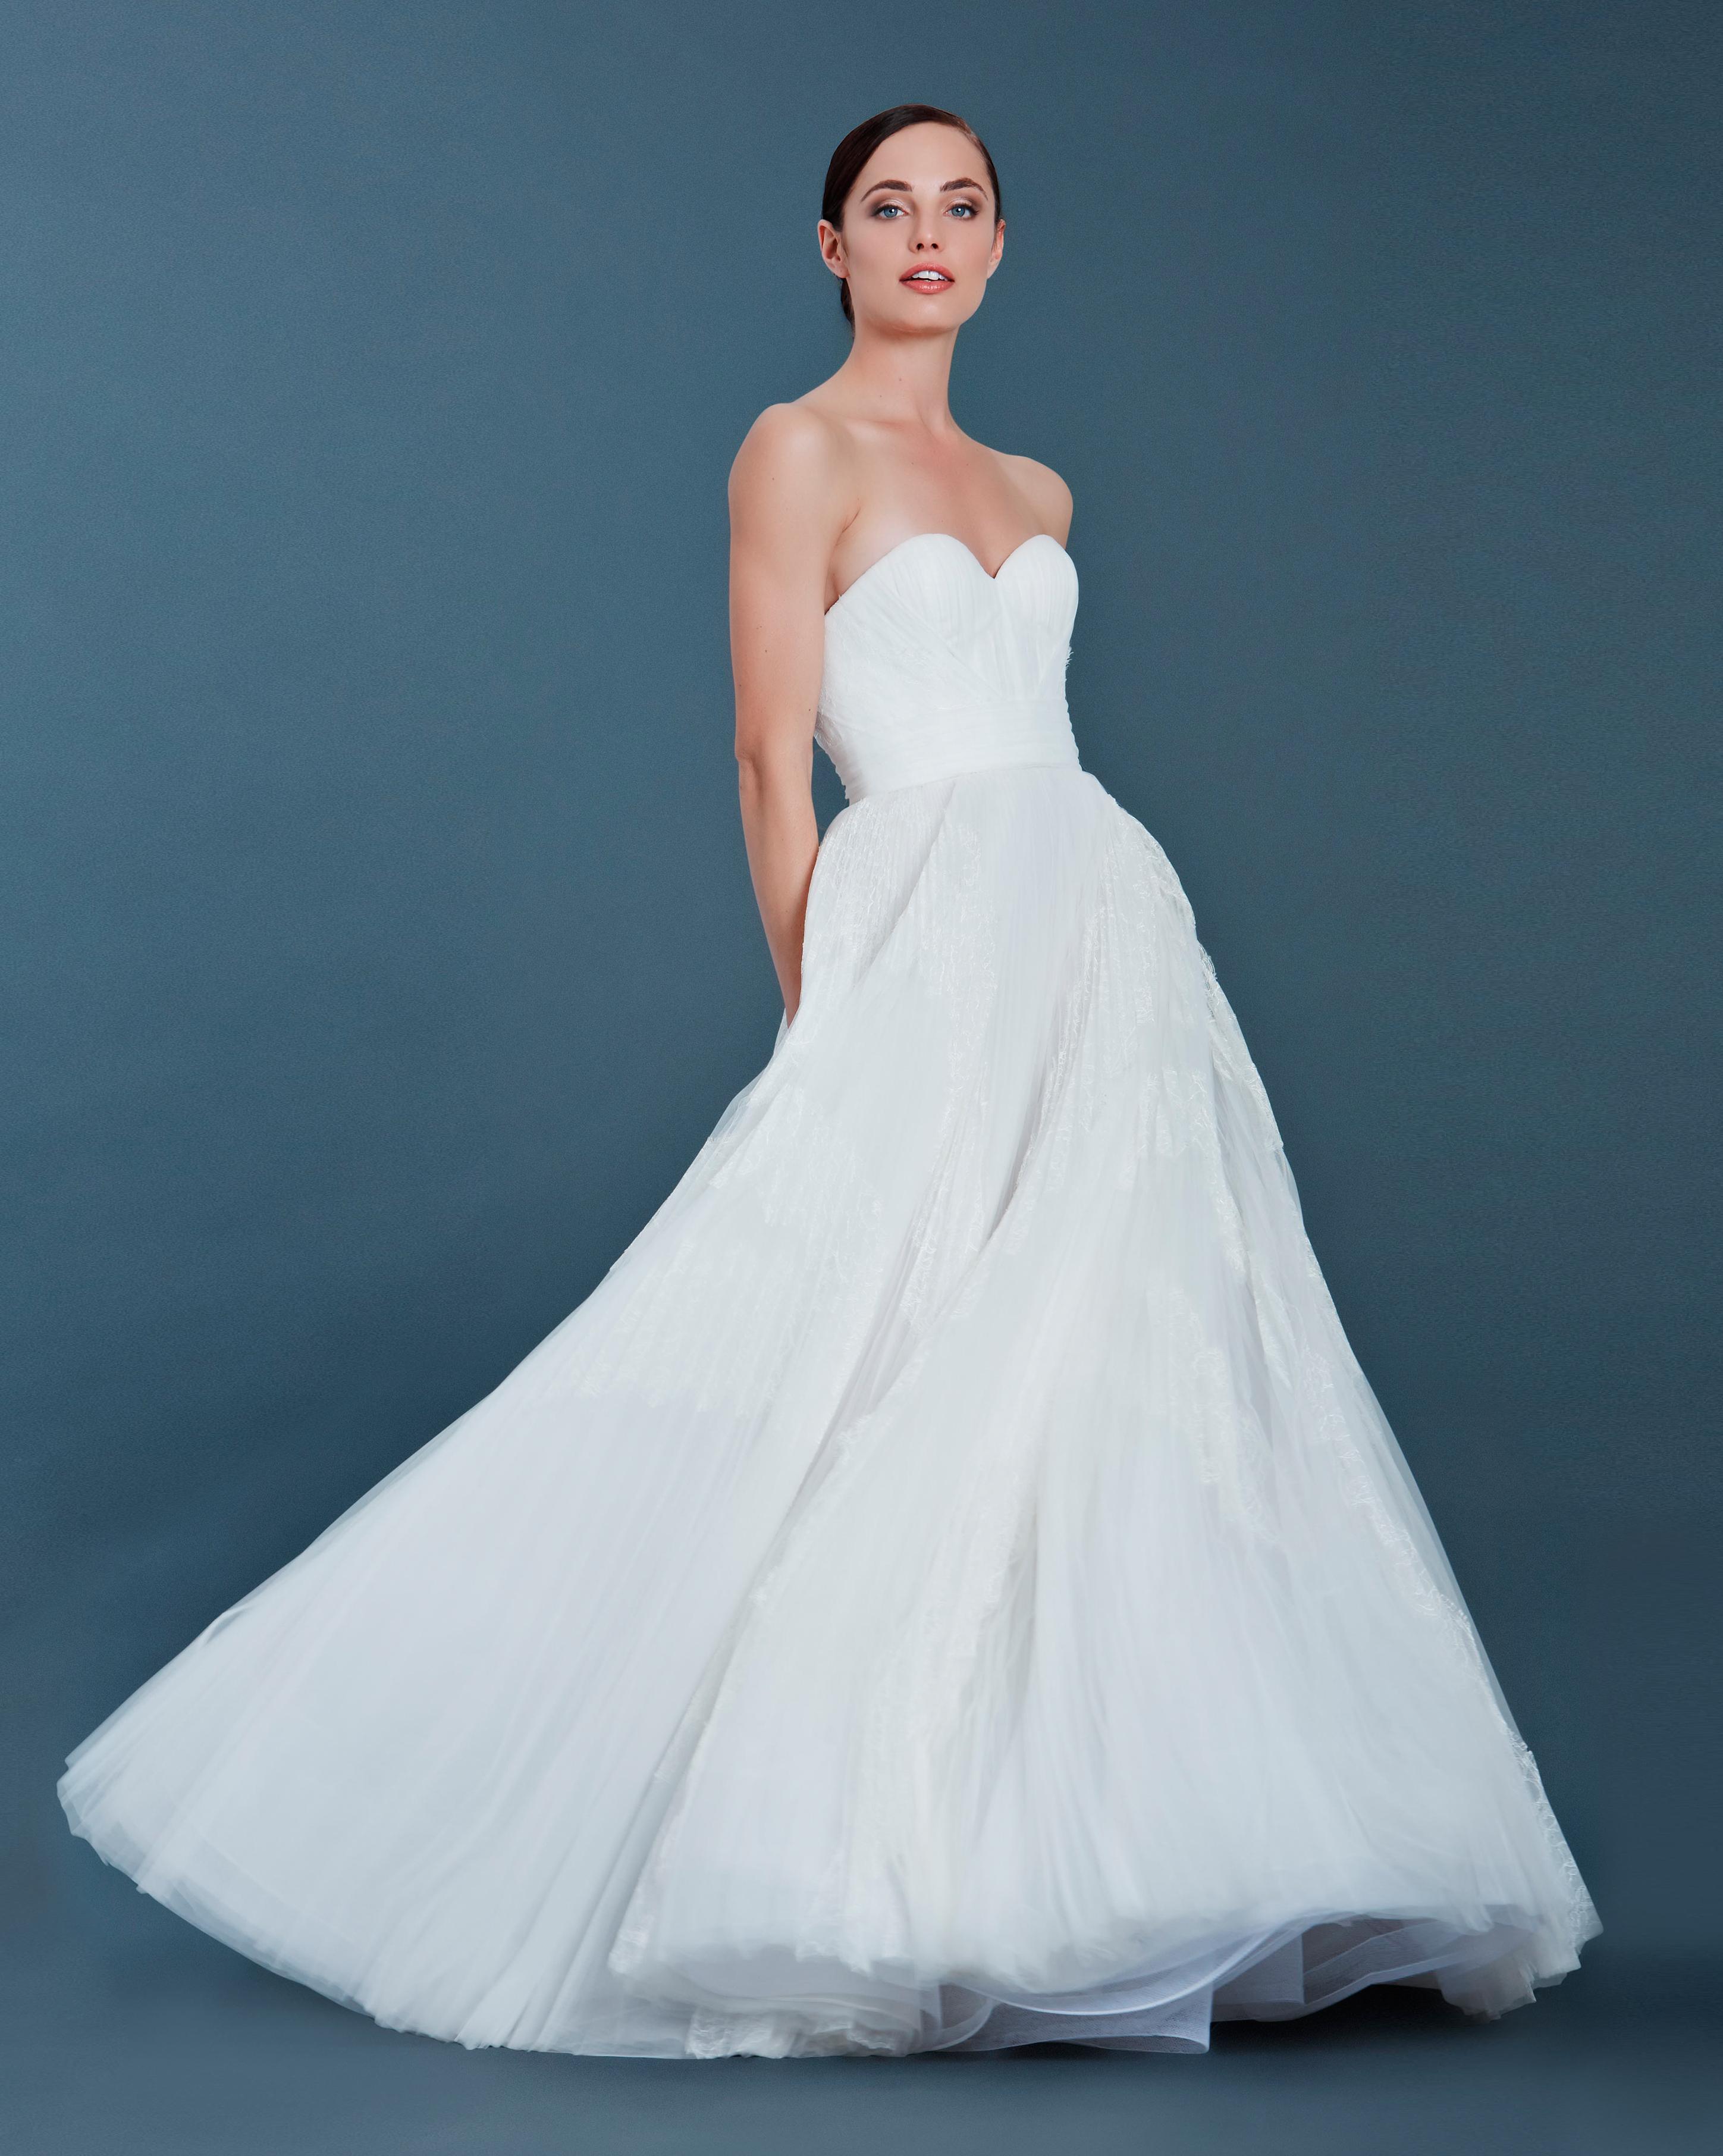 jmendel-fall2016-wedding-dress-12-penelope.jpg